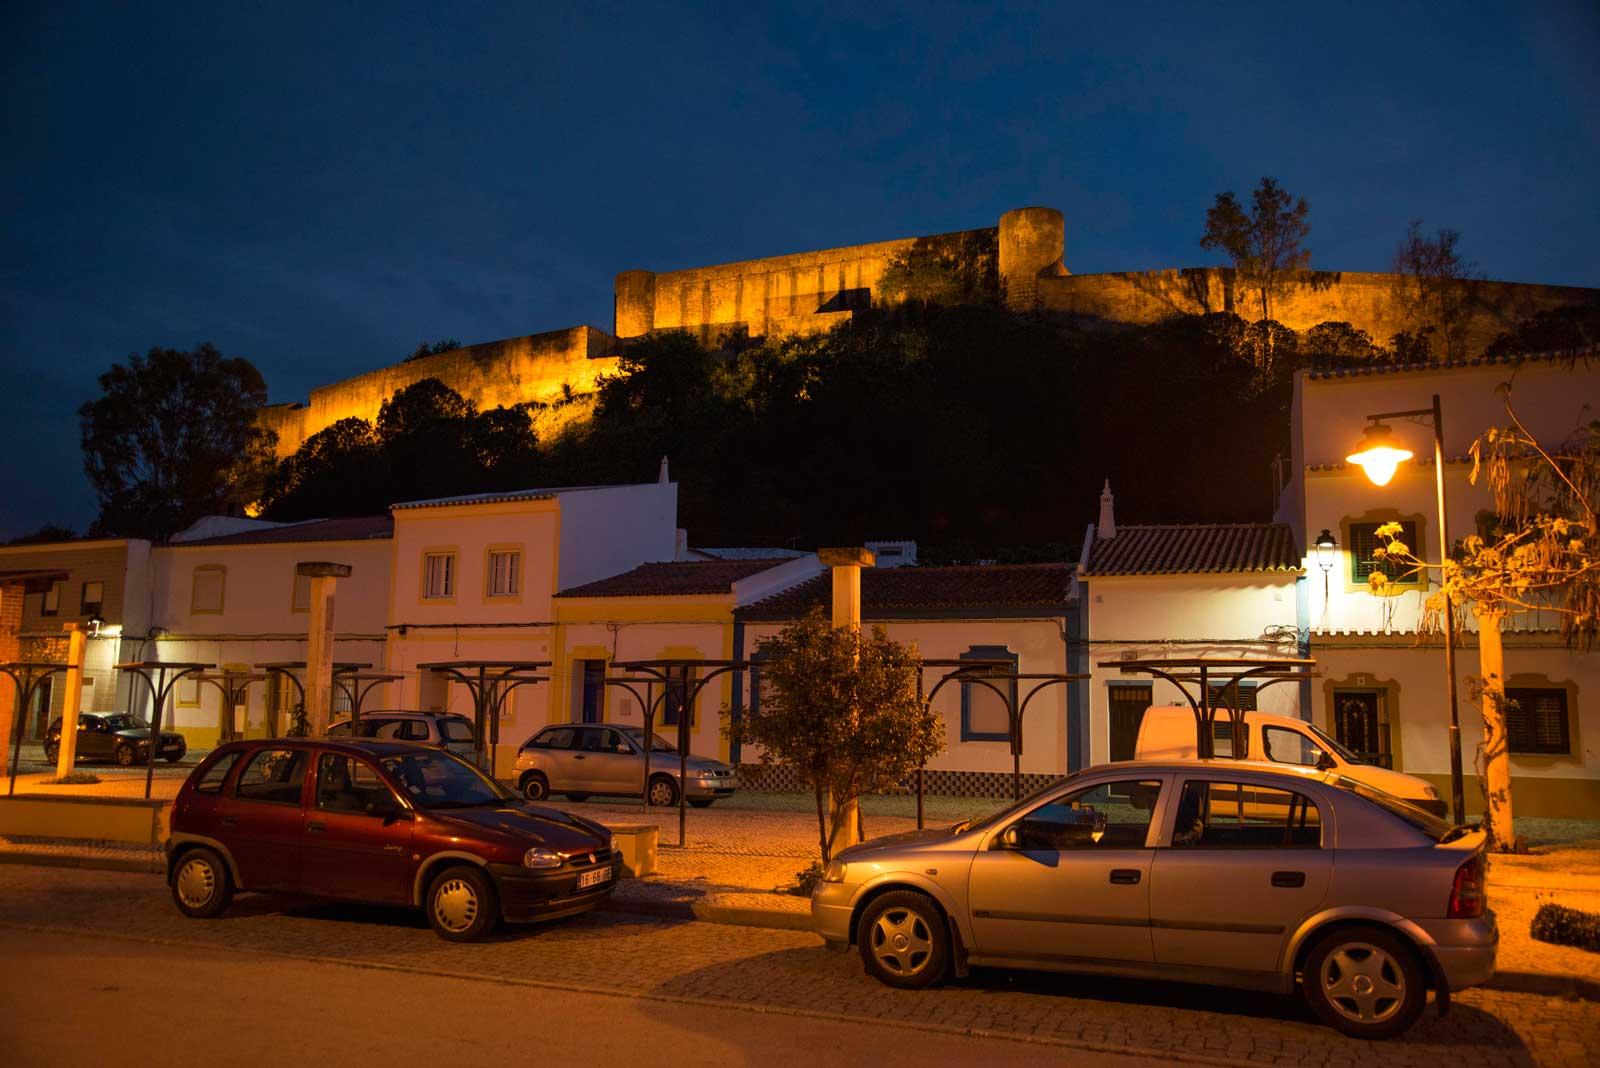 Borgen i Castro Marim var vakkert opplyst på kvelden